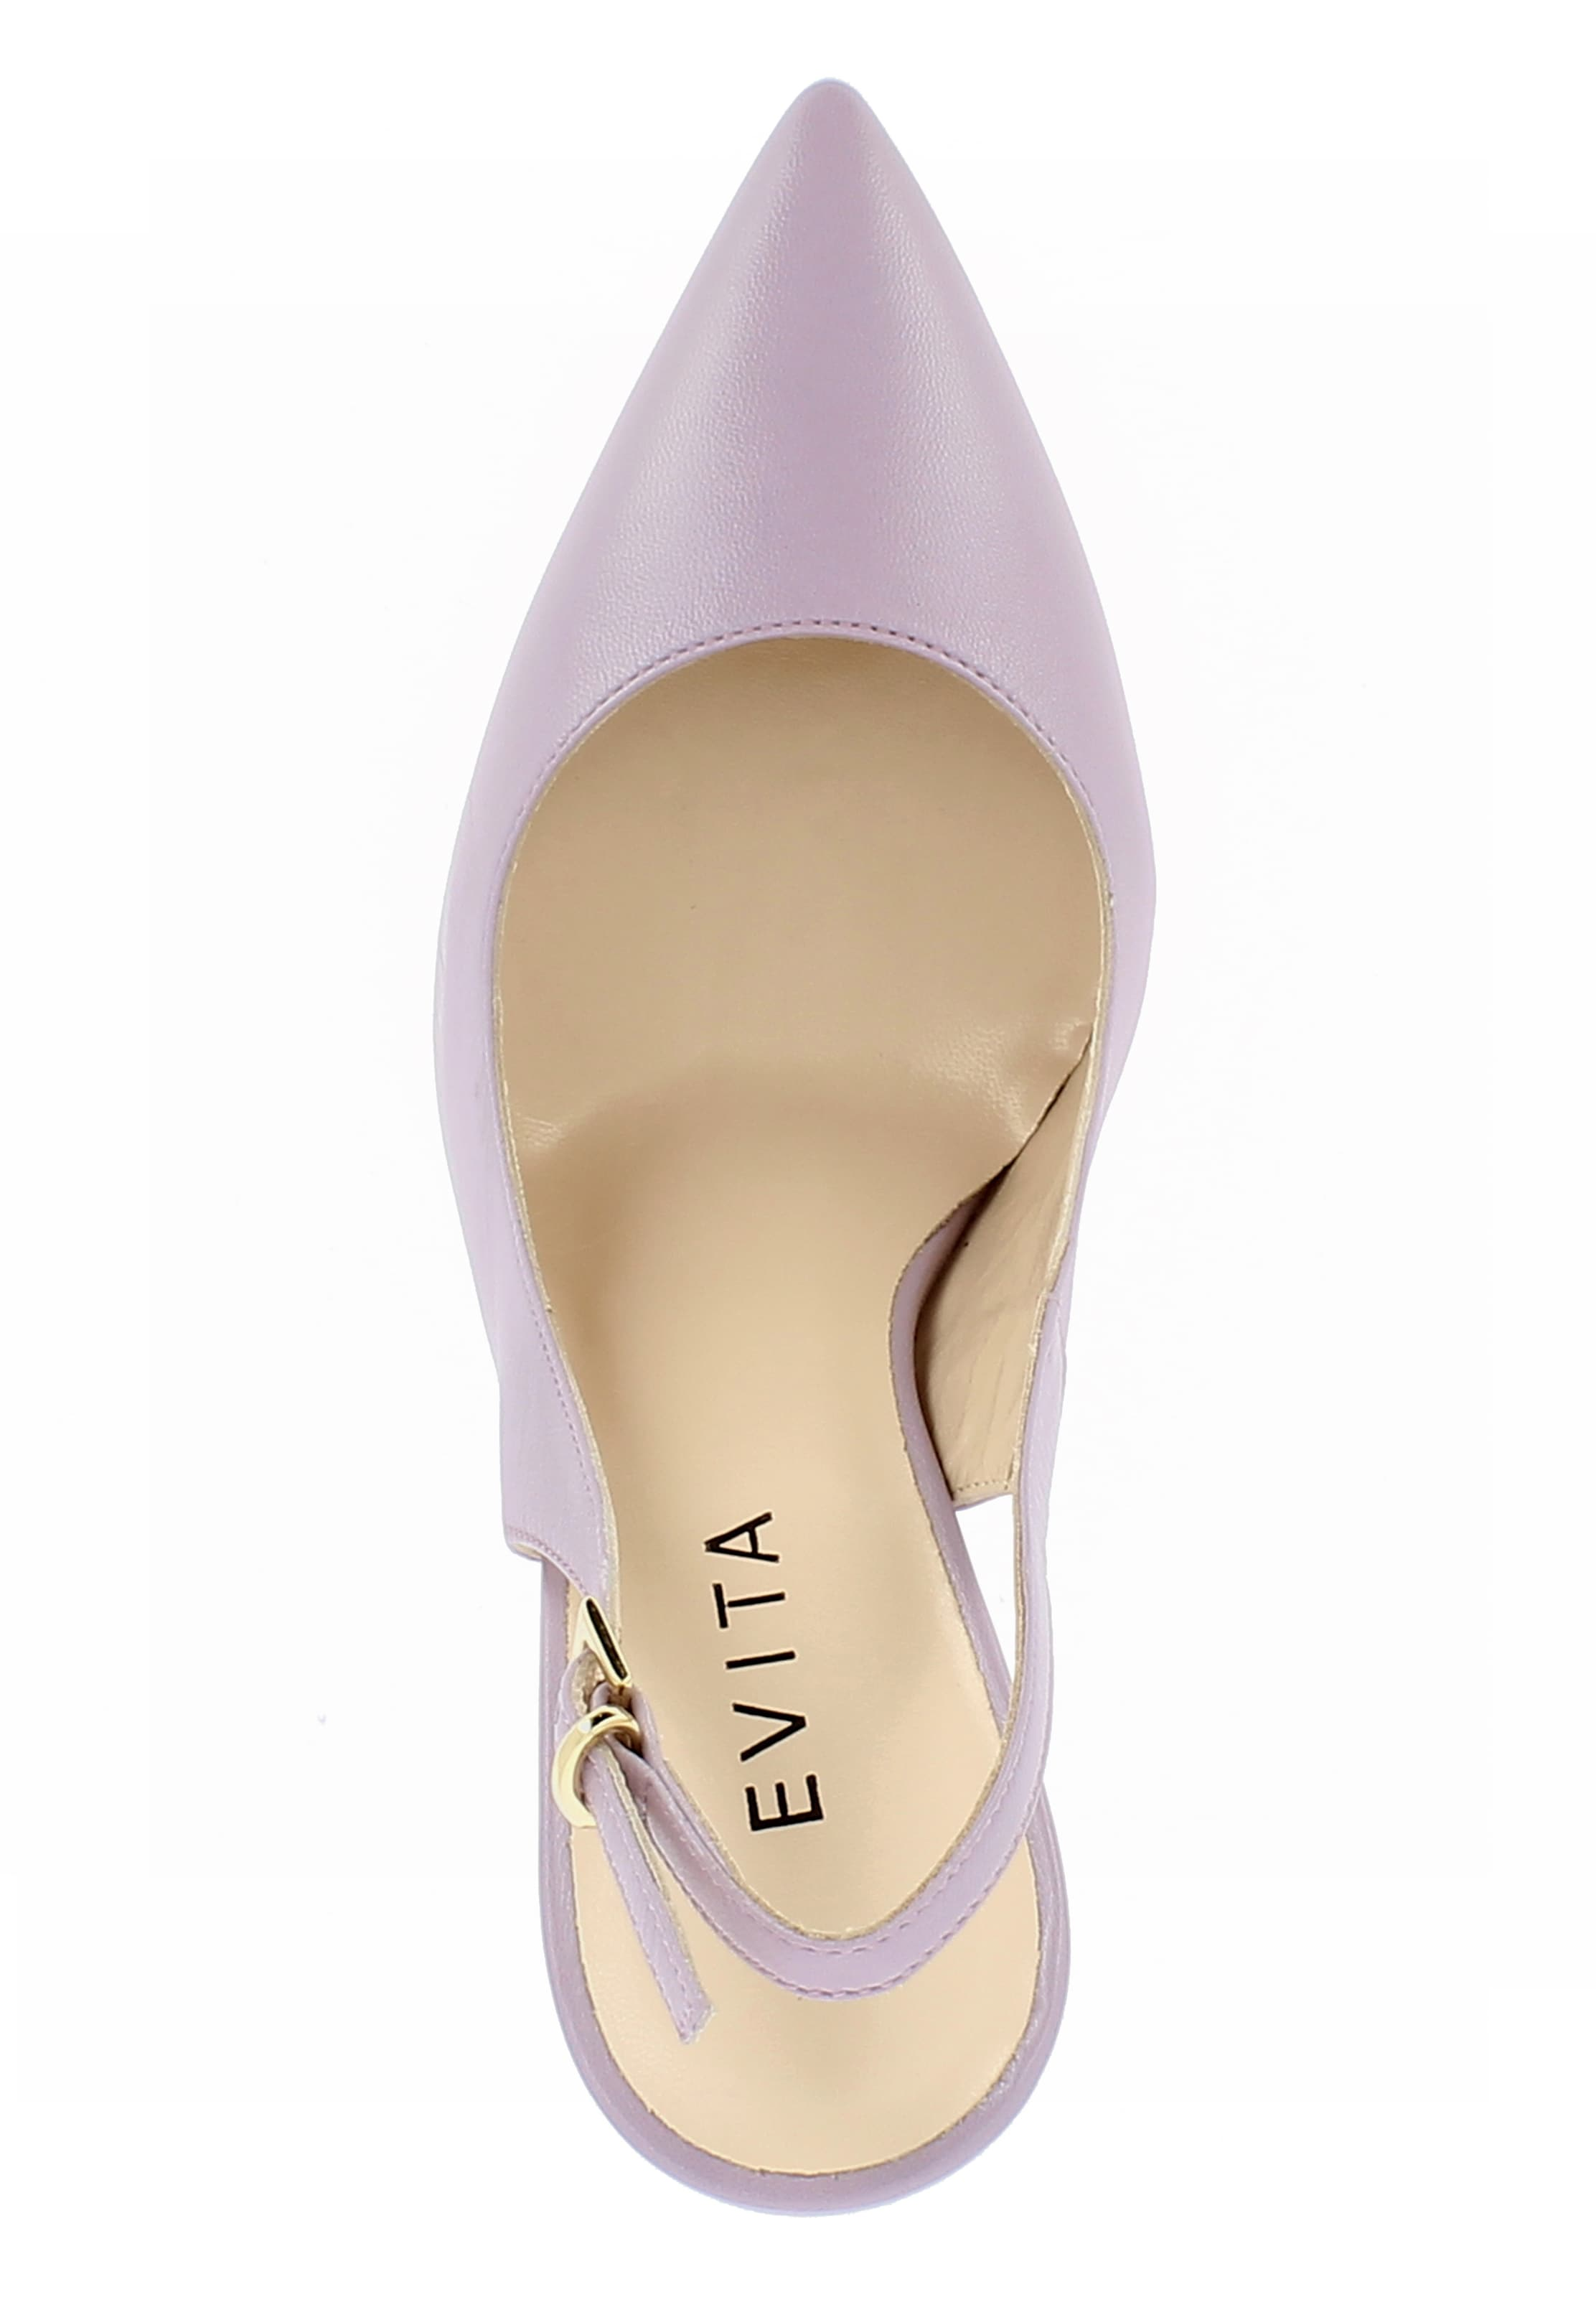 Sling Evita In Pumps 'alina' Flieder vmNn0y8wO